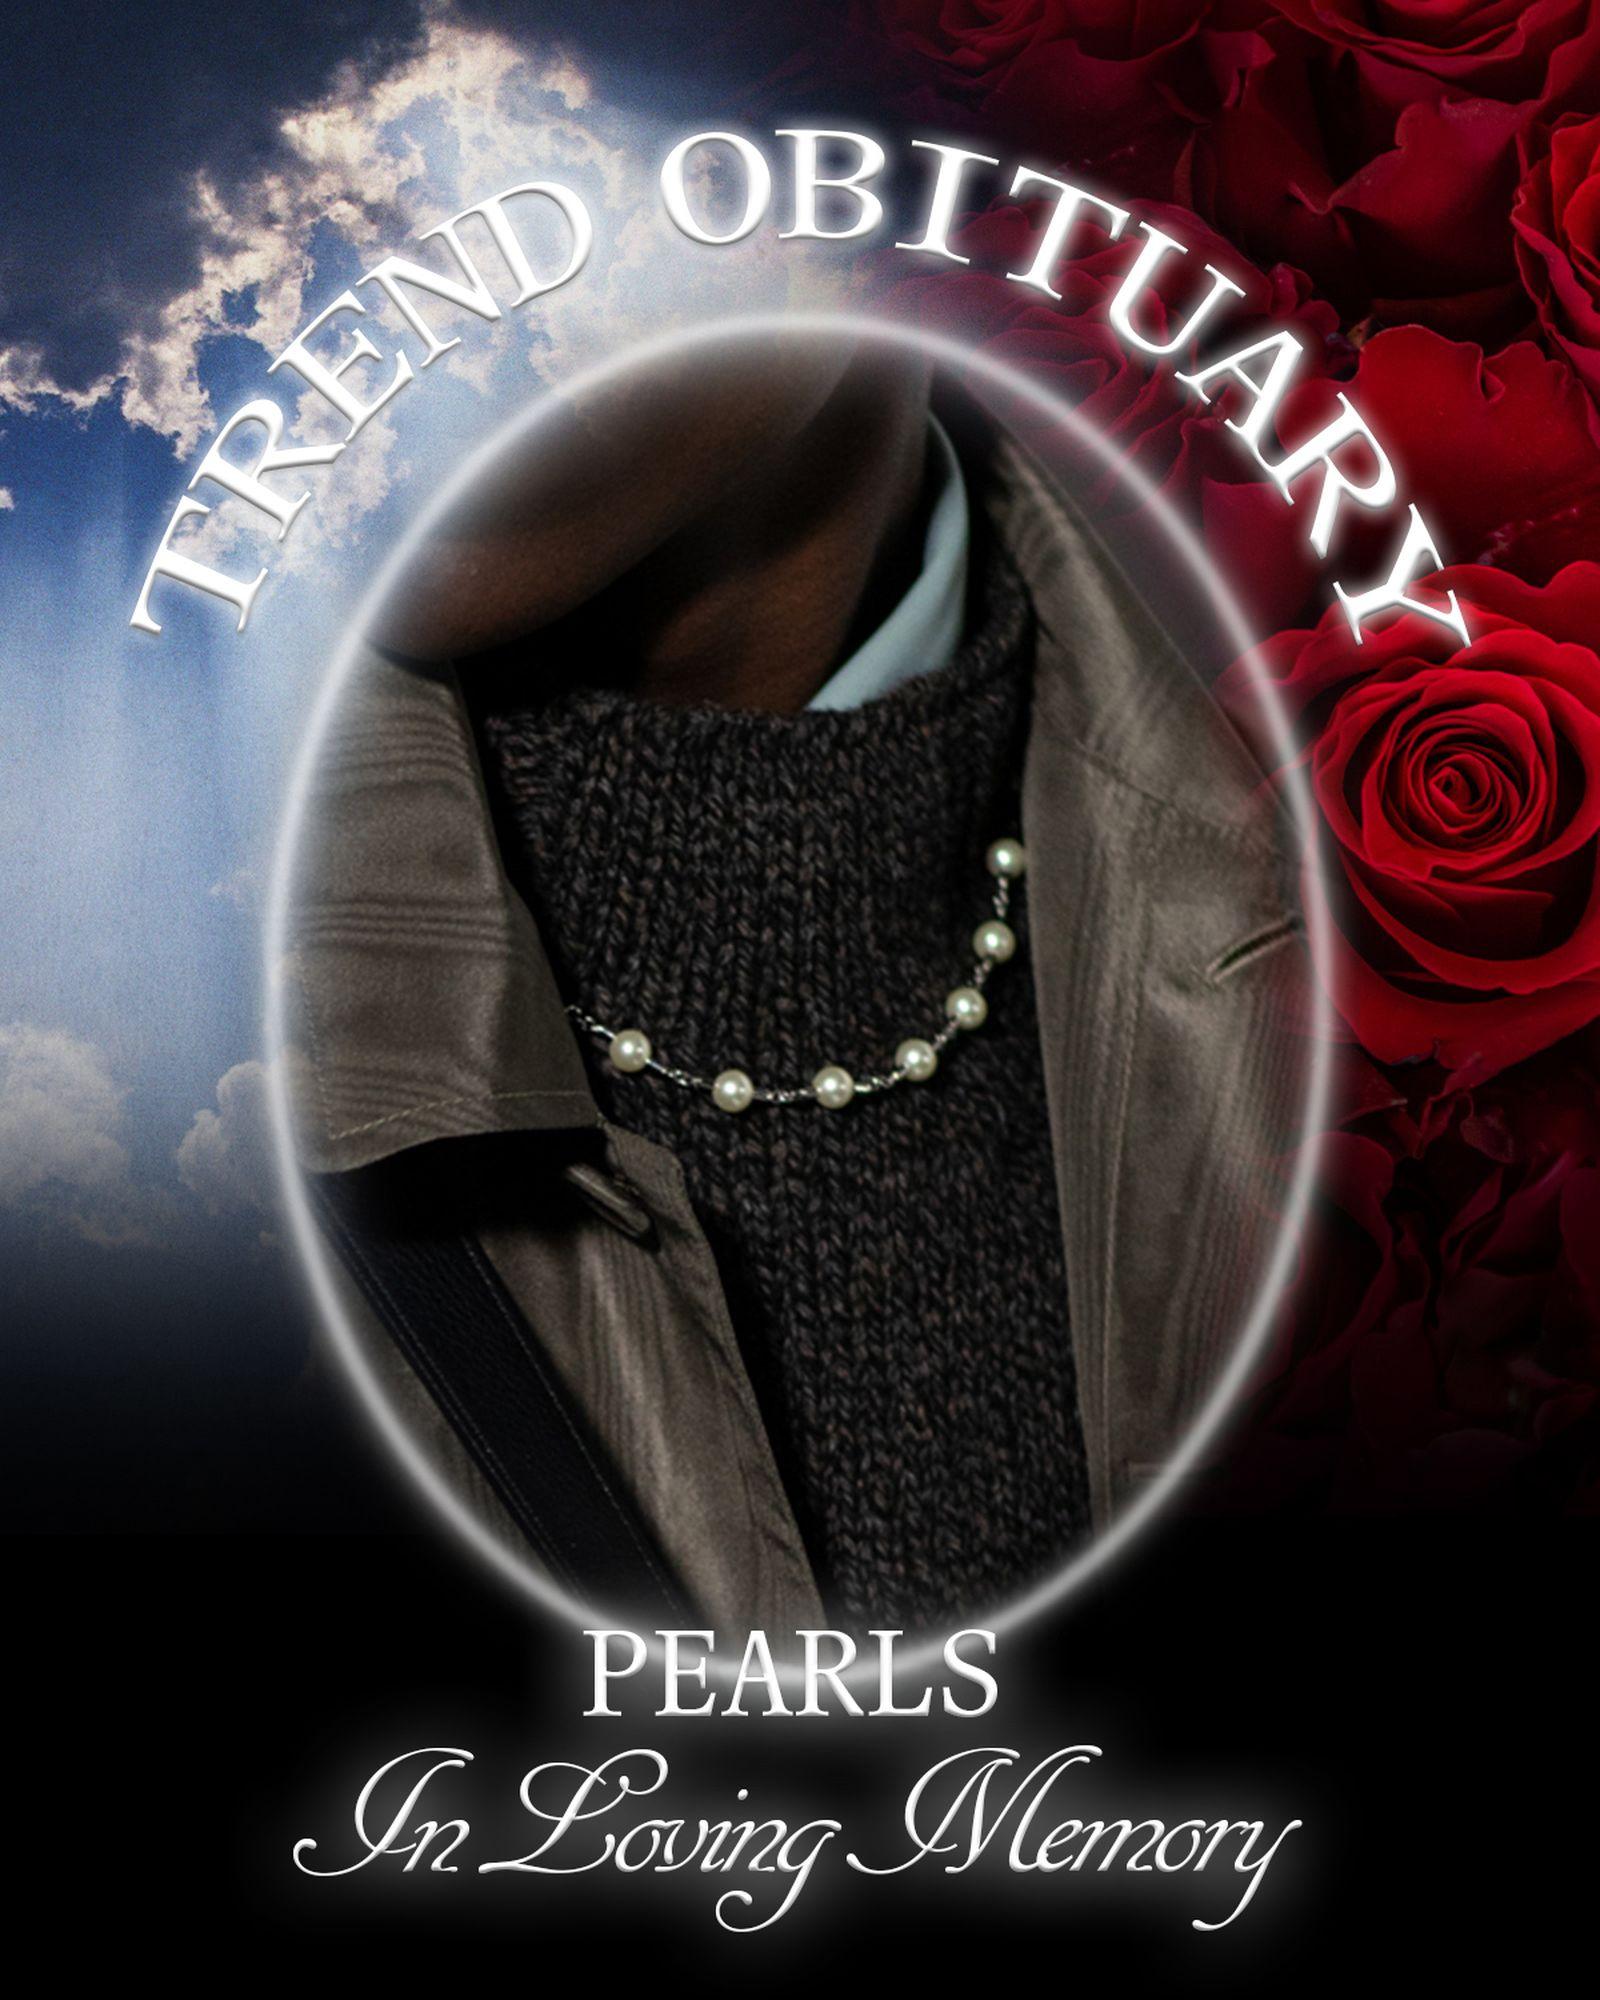 trend-obituary-pearls-main